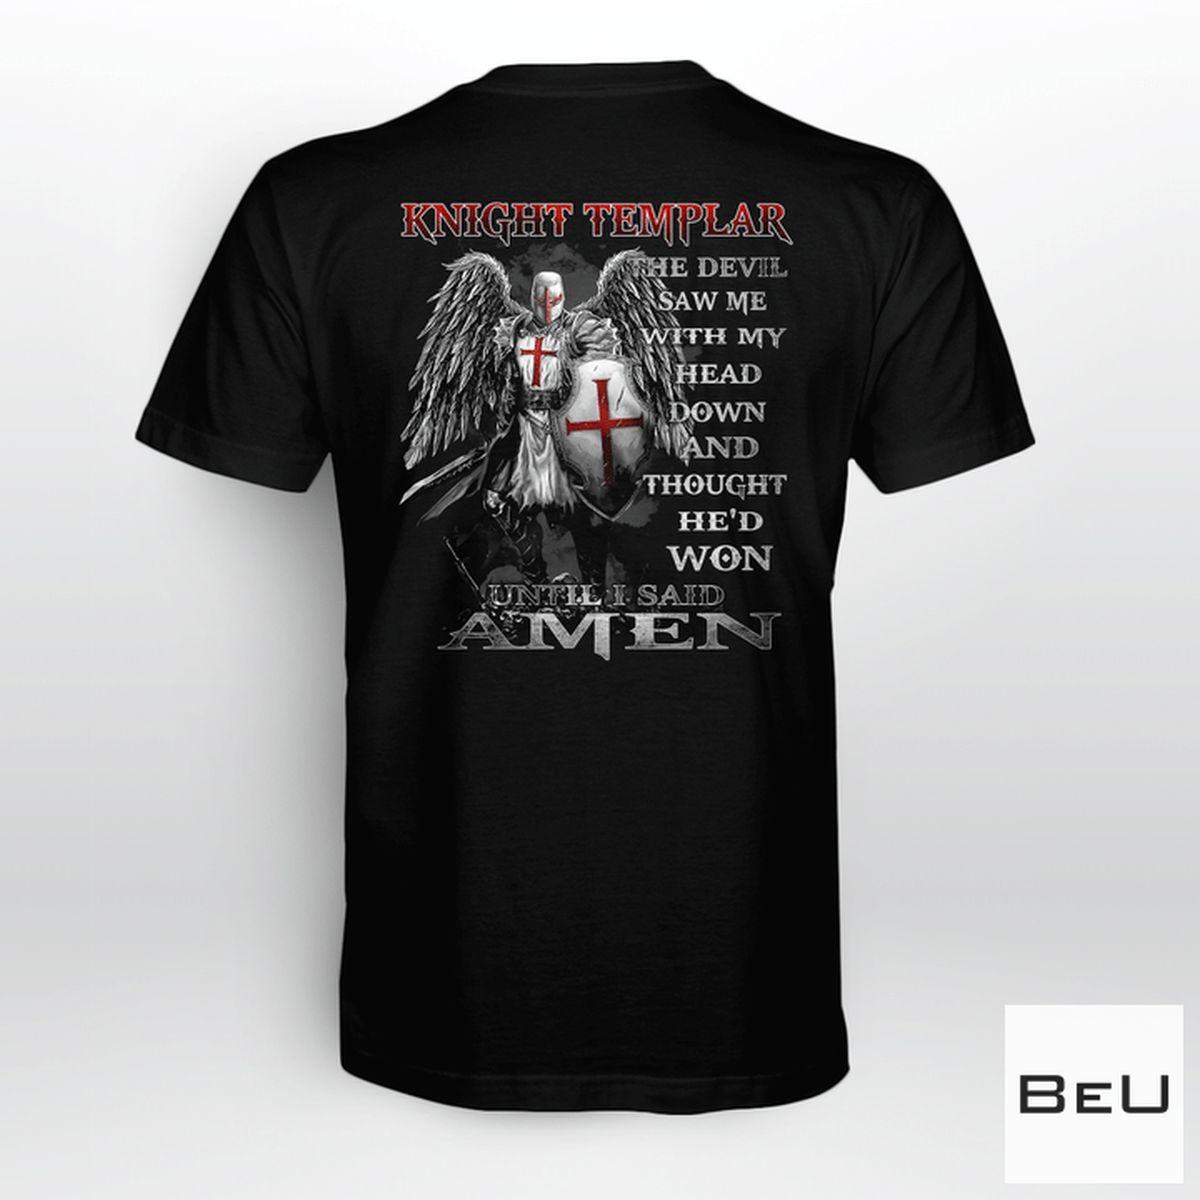 Jesus Knight Templar Until I Said Amen Shirt